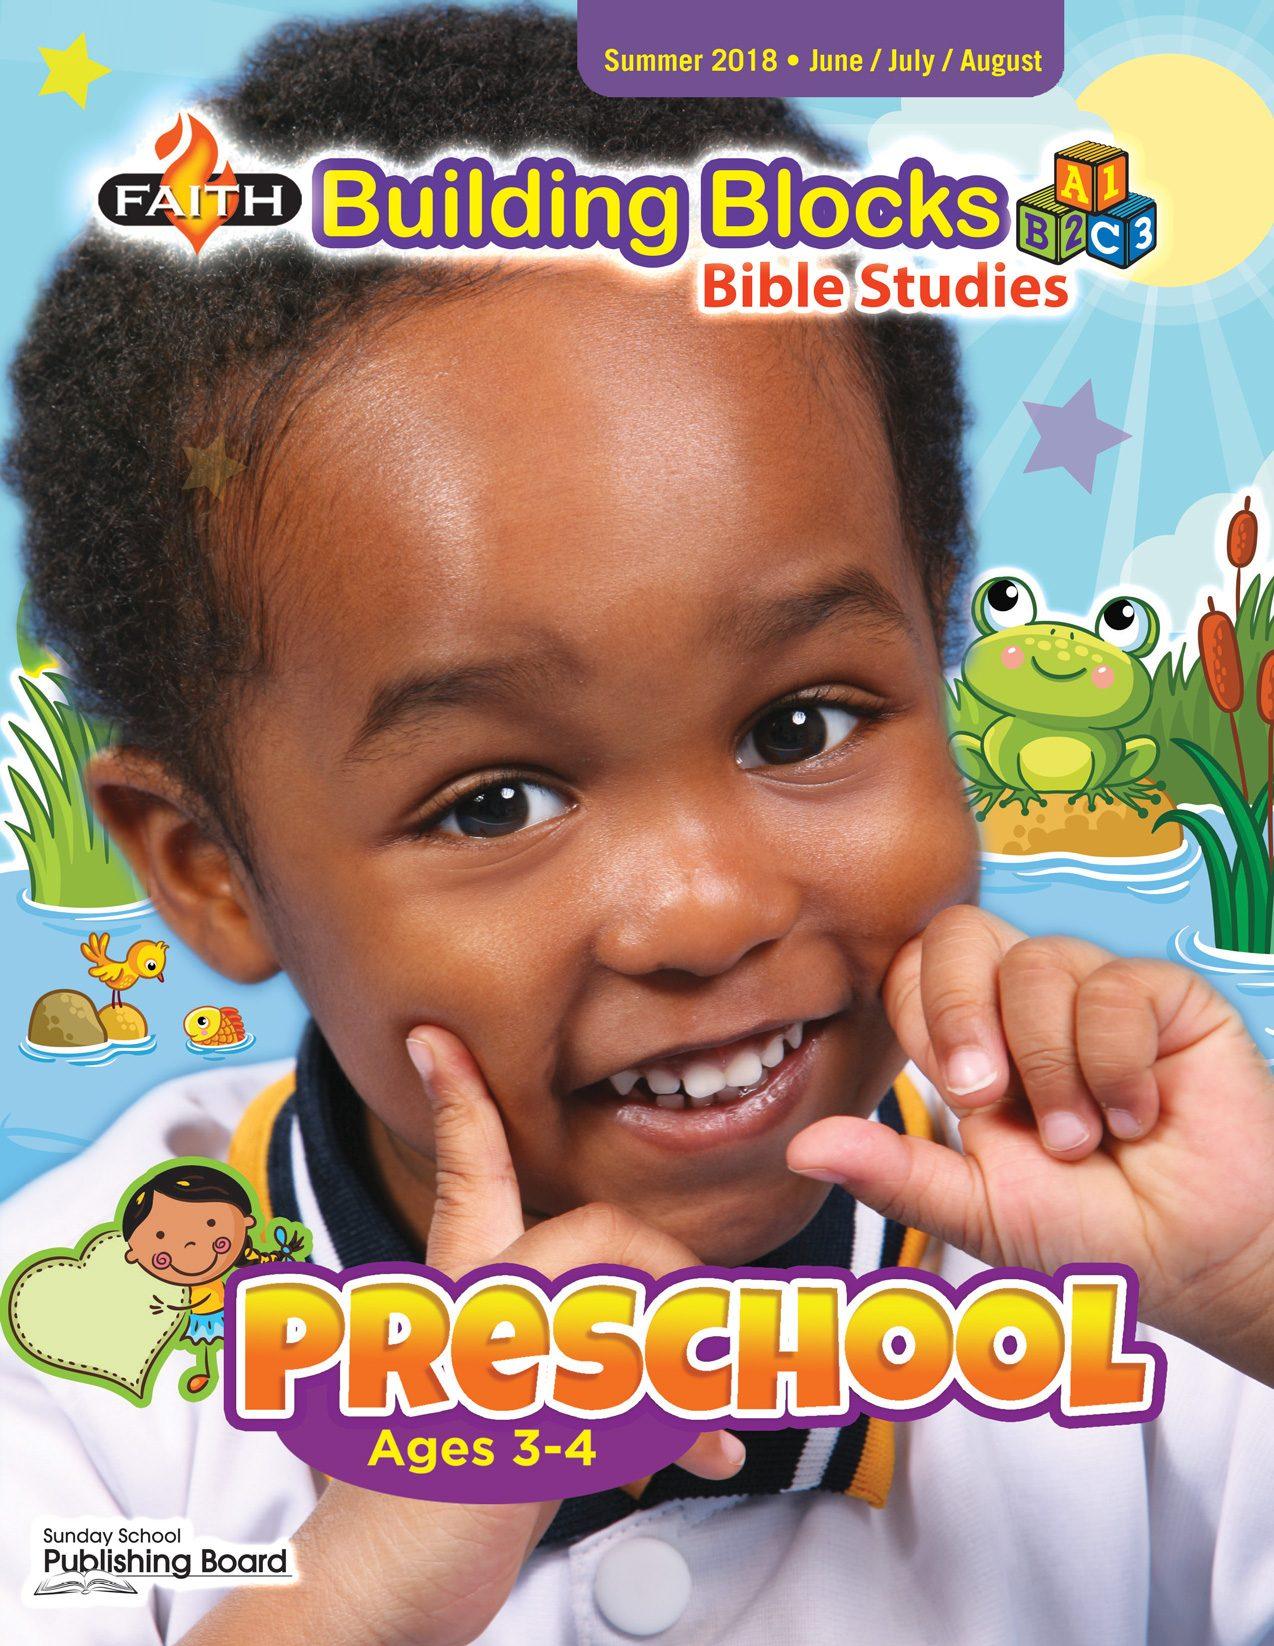 Faith Building Blocks Bible Studies, Preschool for Ages 3-4 (Summer 2018)-Digital Edition